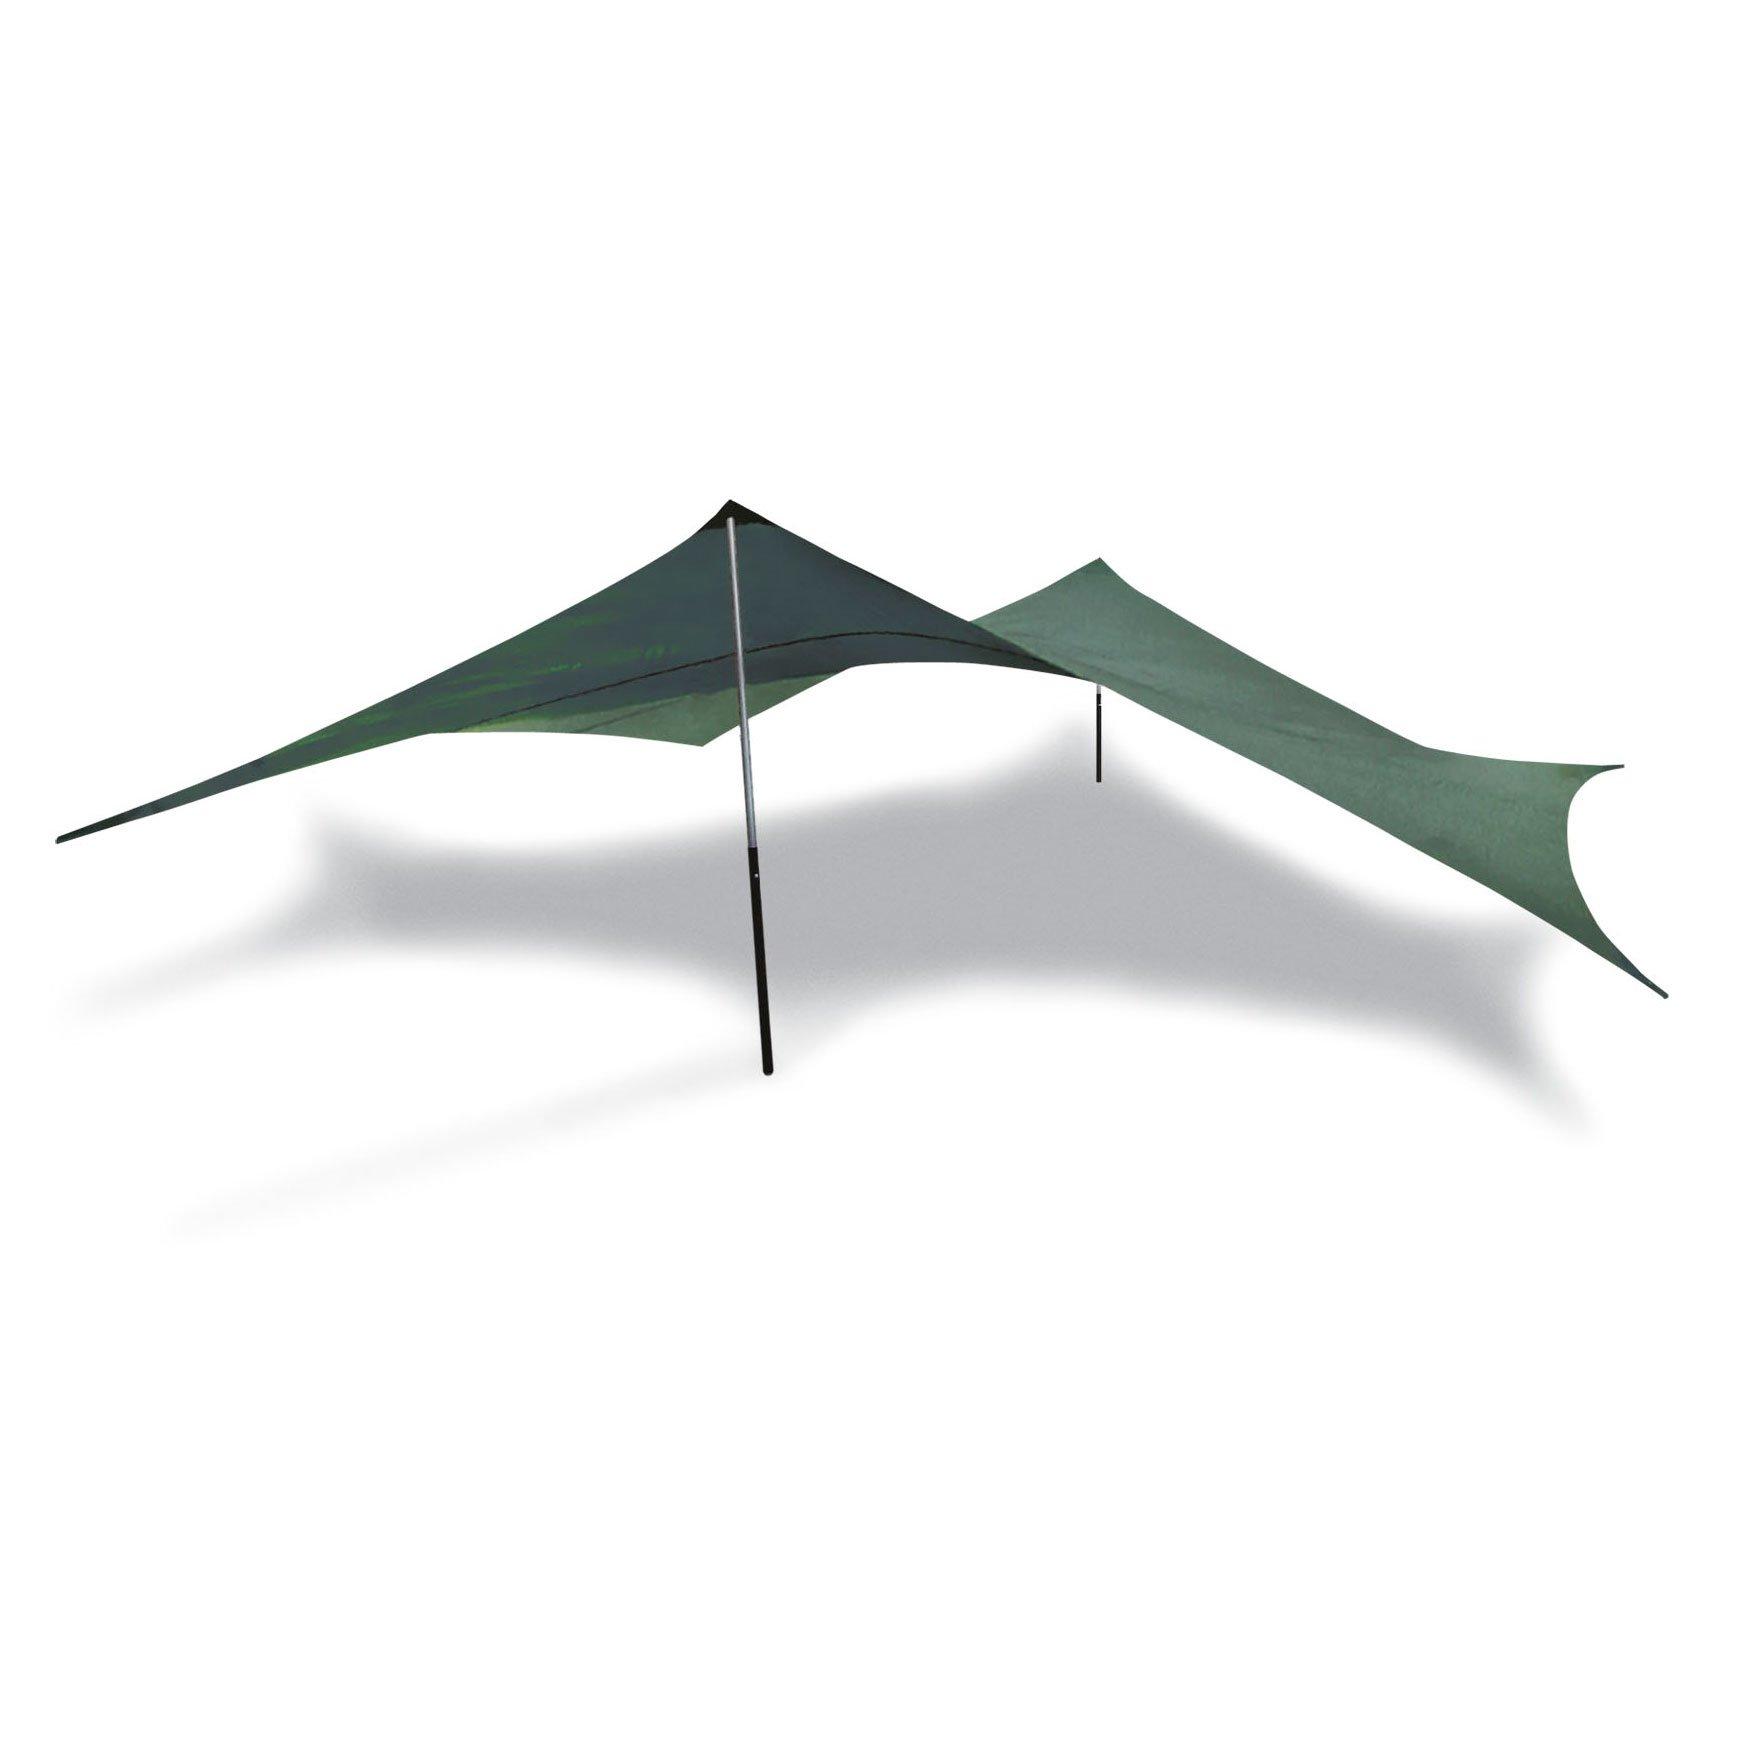 Hilleberg - Tarp 10 XP - Green